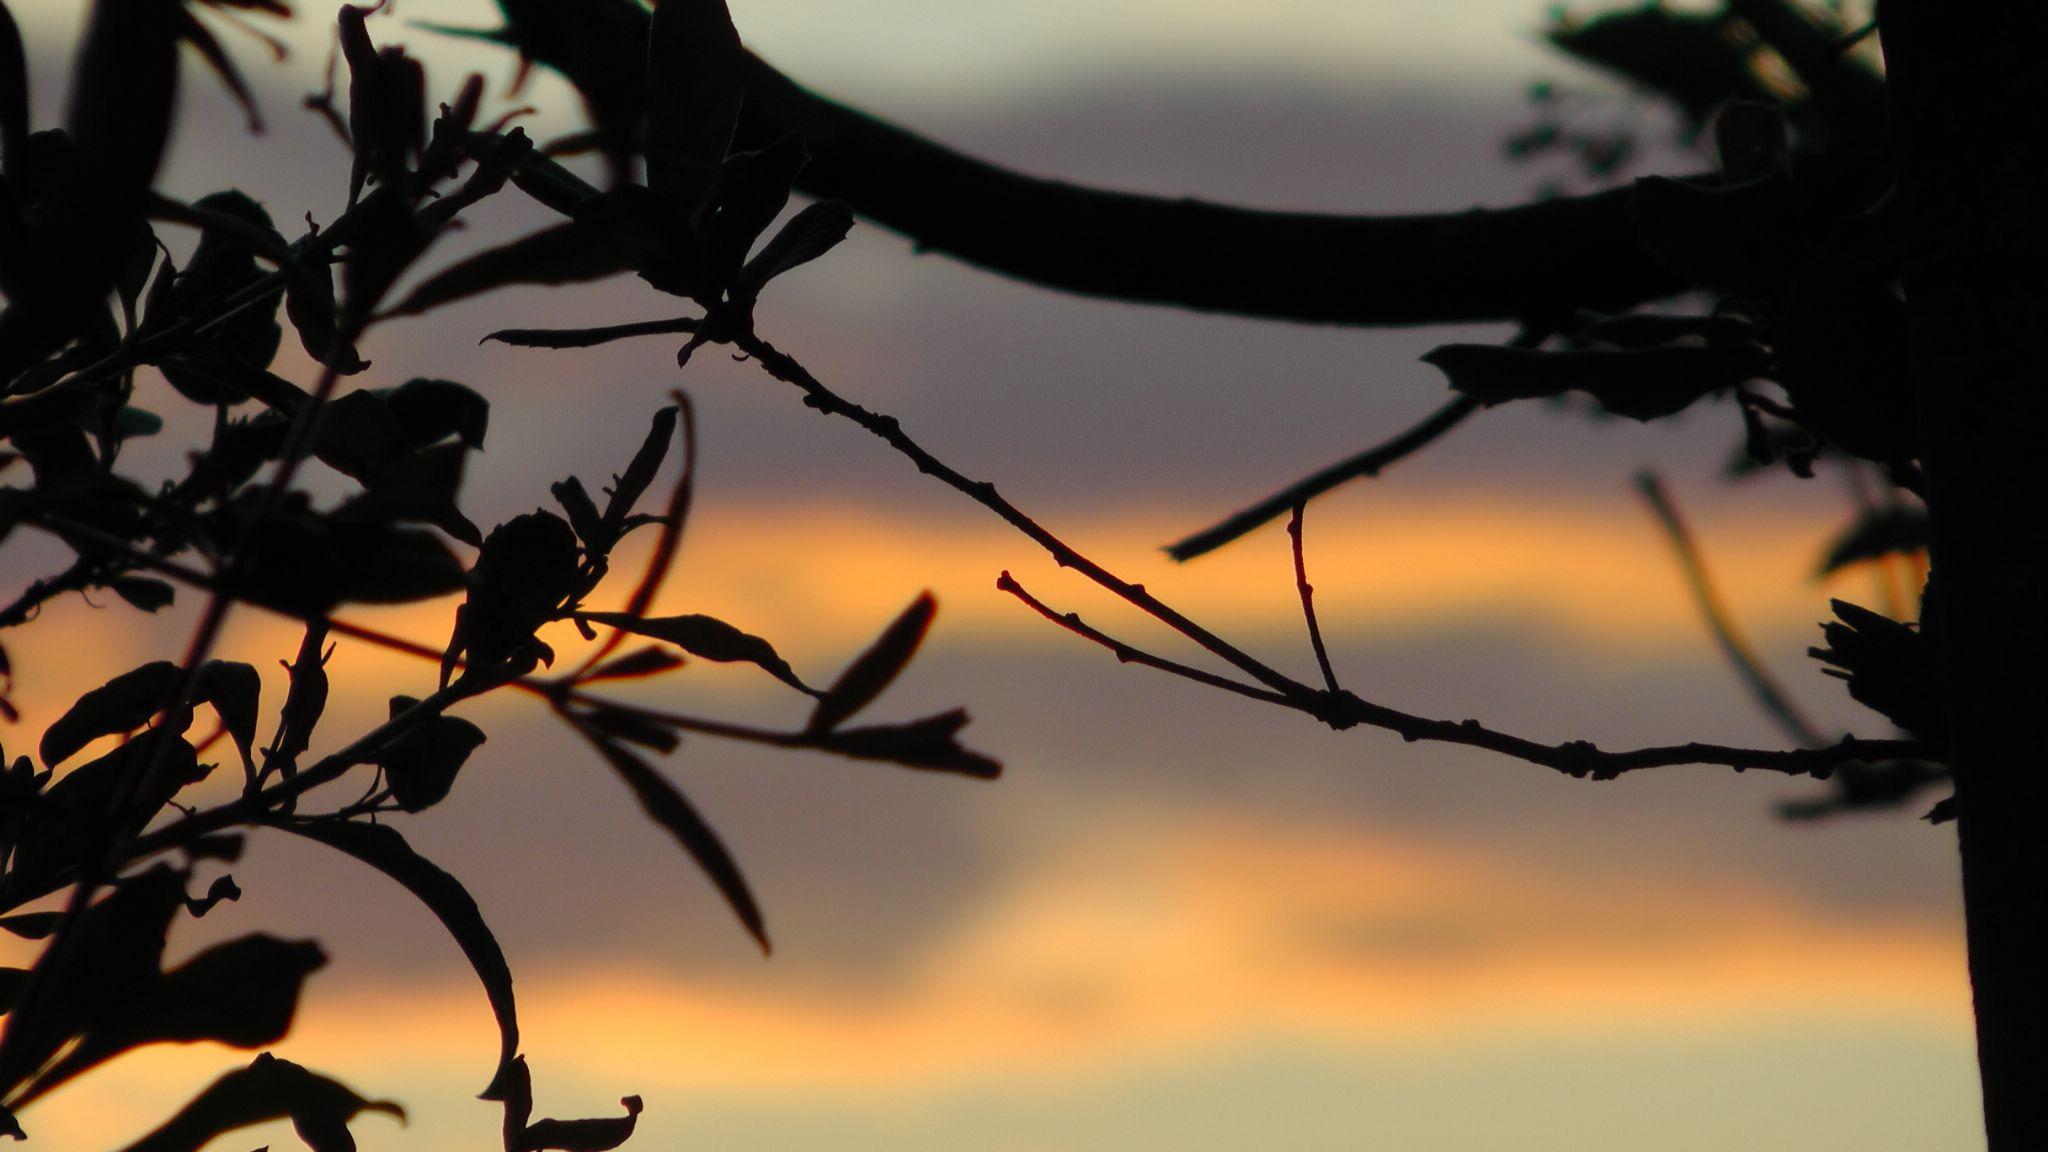 sunset  by Letizia Rostagno